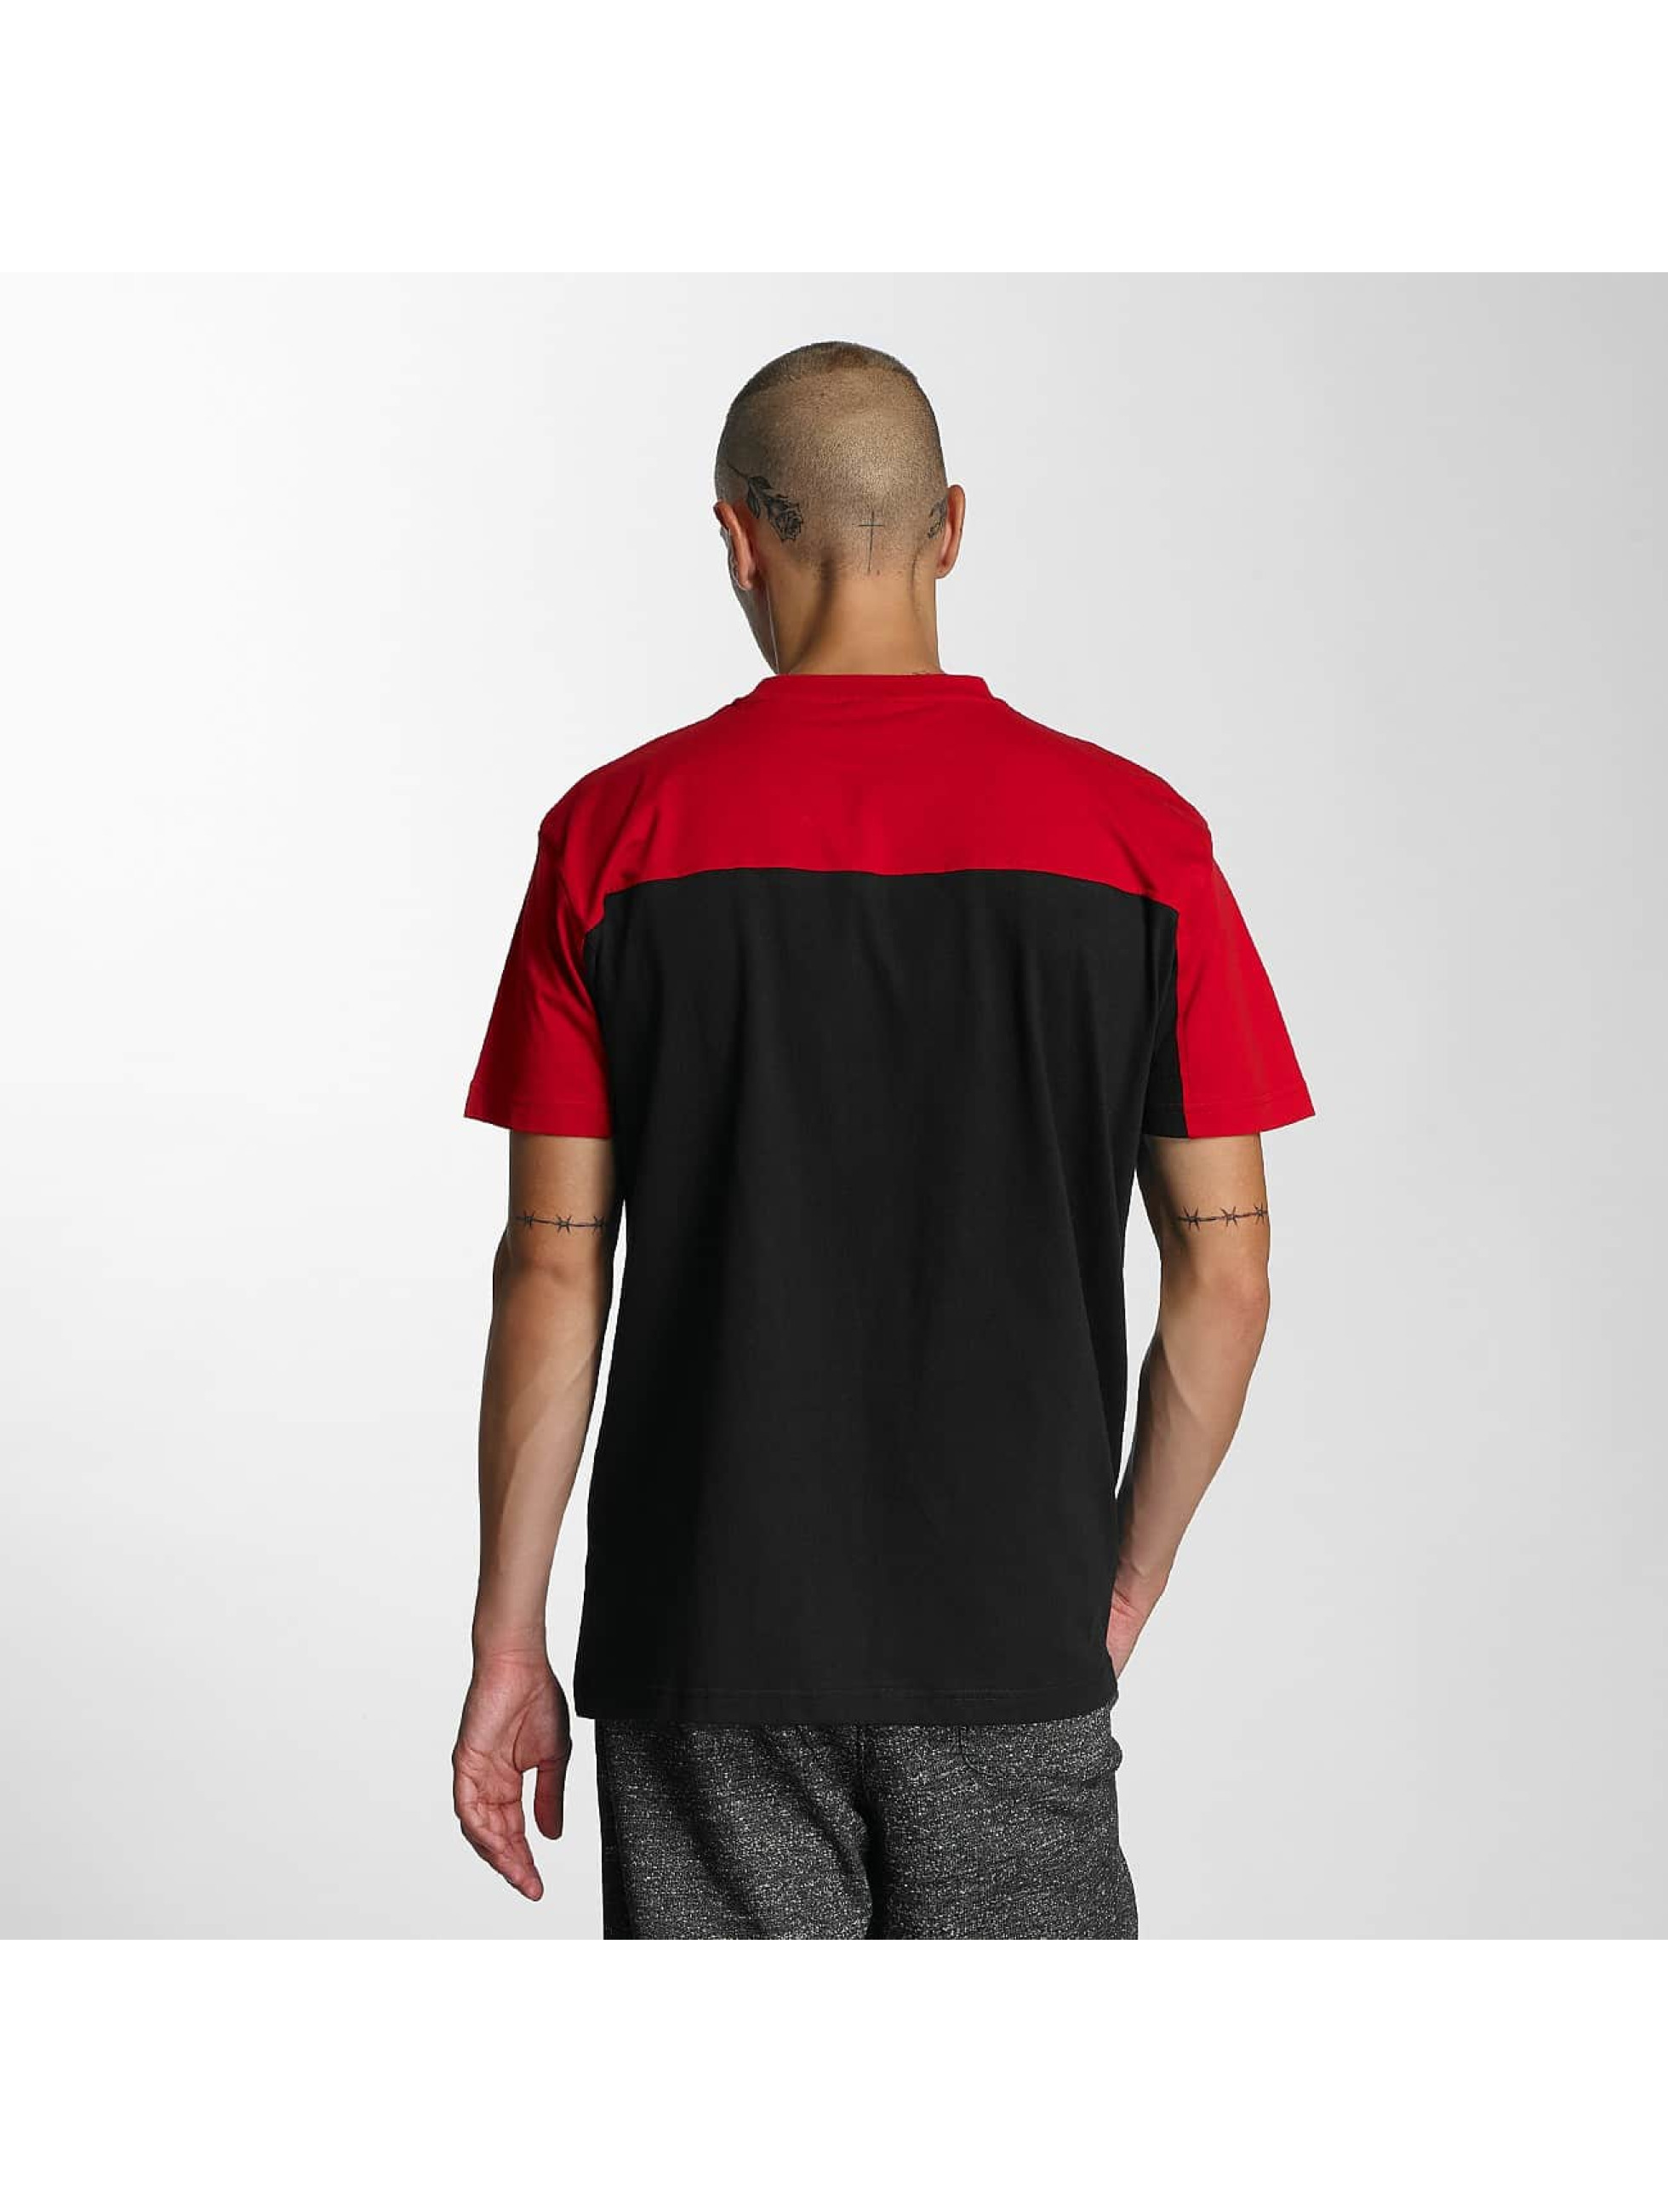 Pusher Apparel T-Shirt Apparel 137 Riot black